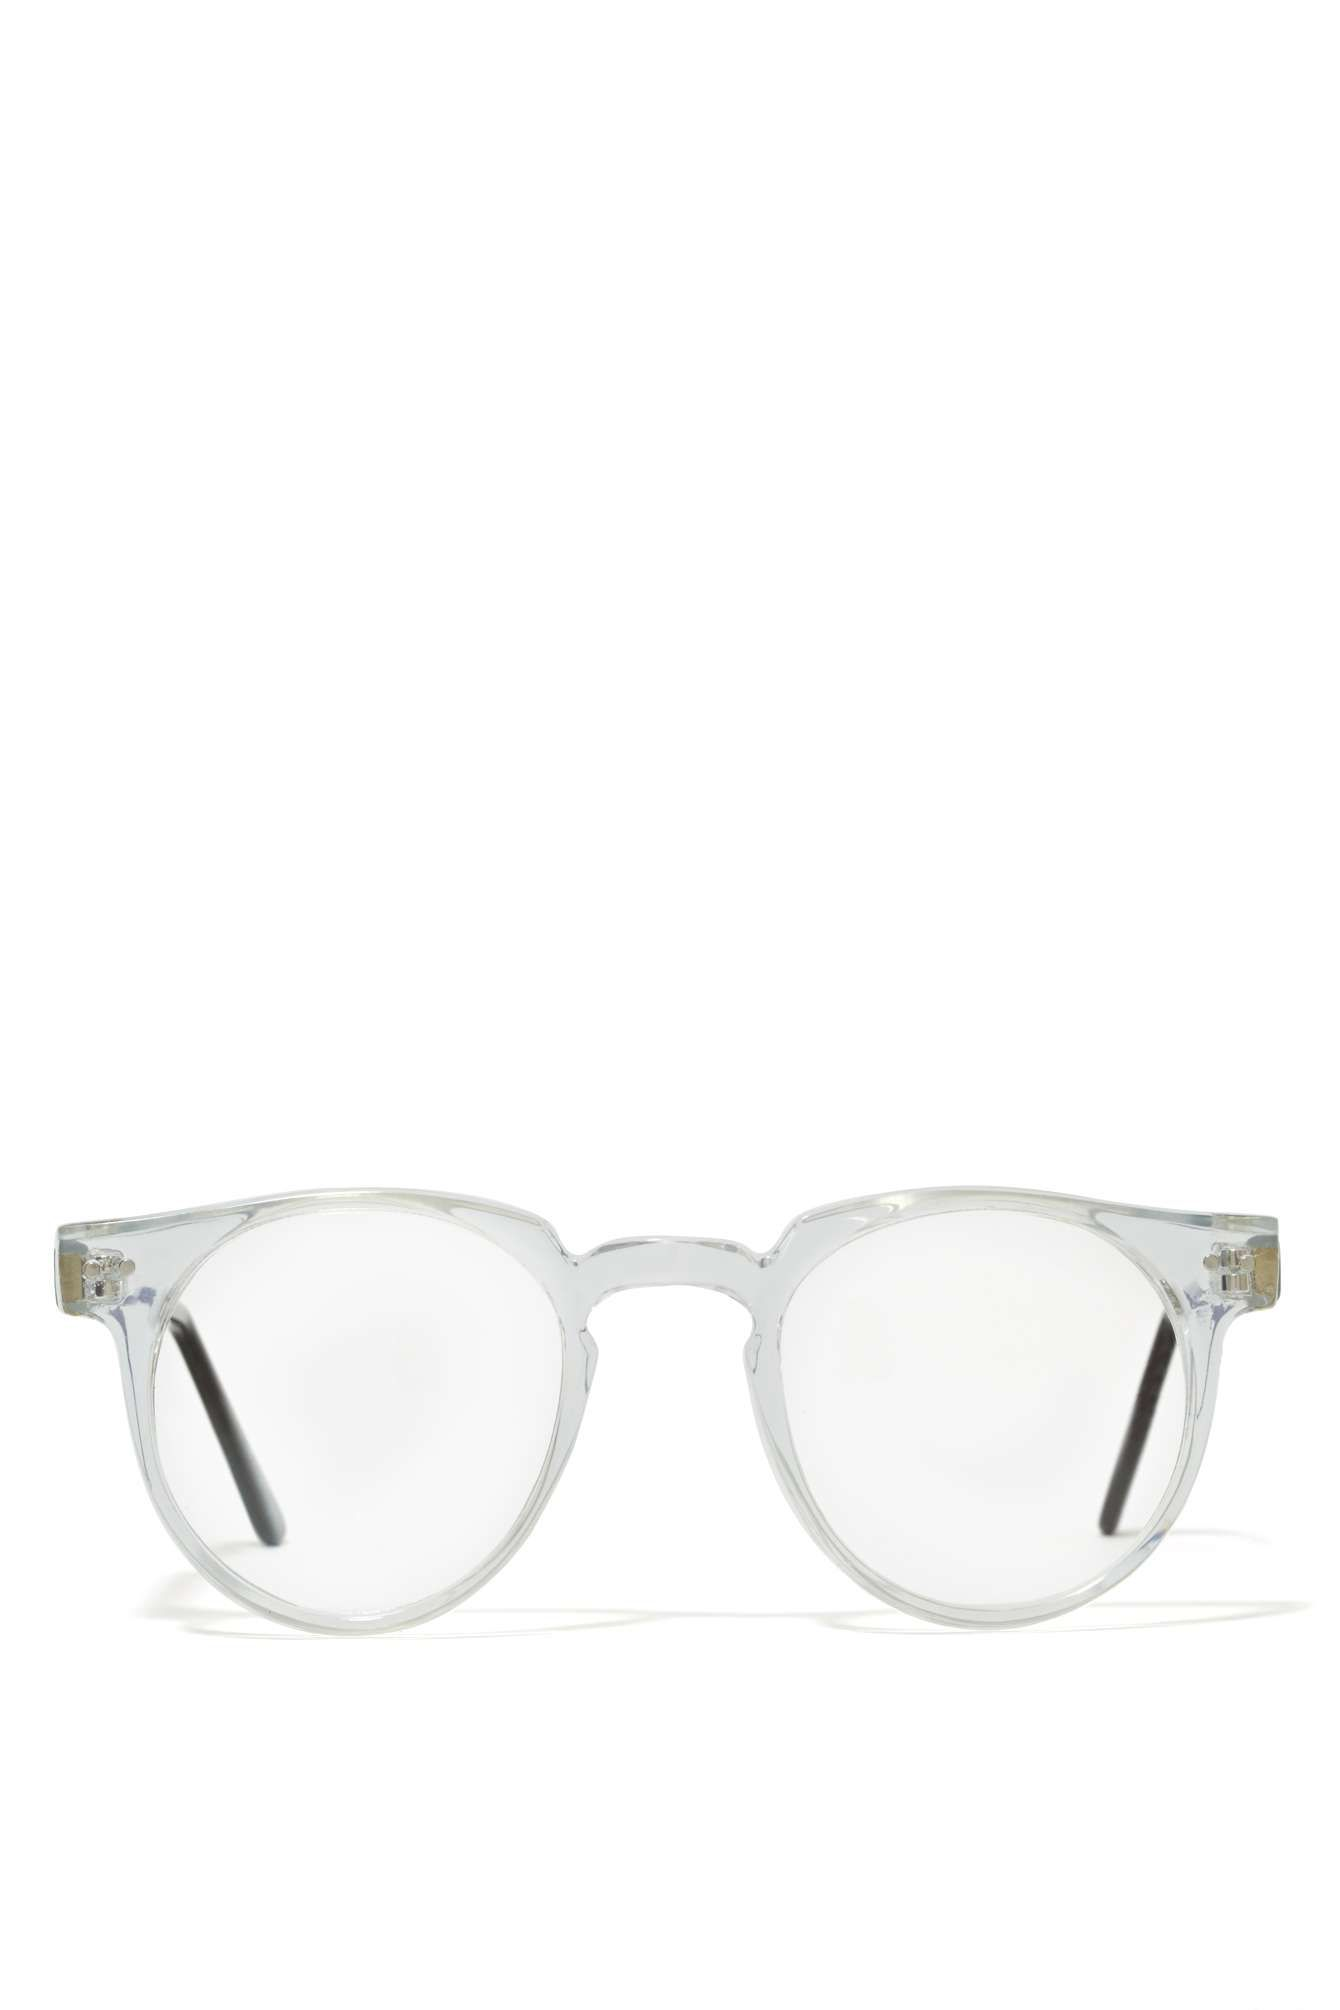 20d121d374 Spitfire Teddy Boy Glasses | Shop Eyewear at Nasty Gal | B-Day ...